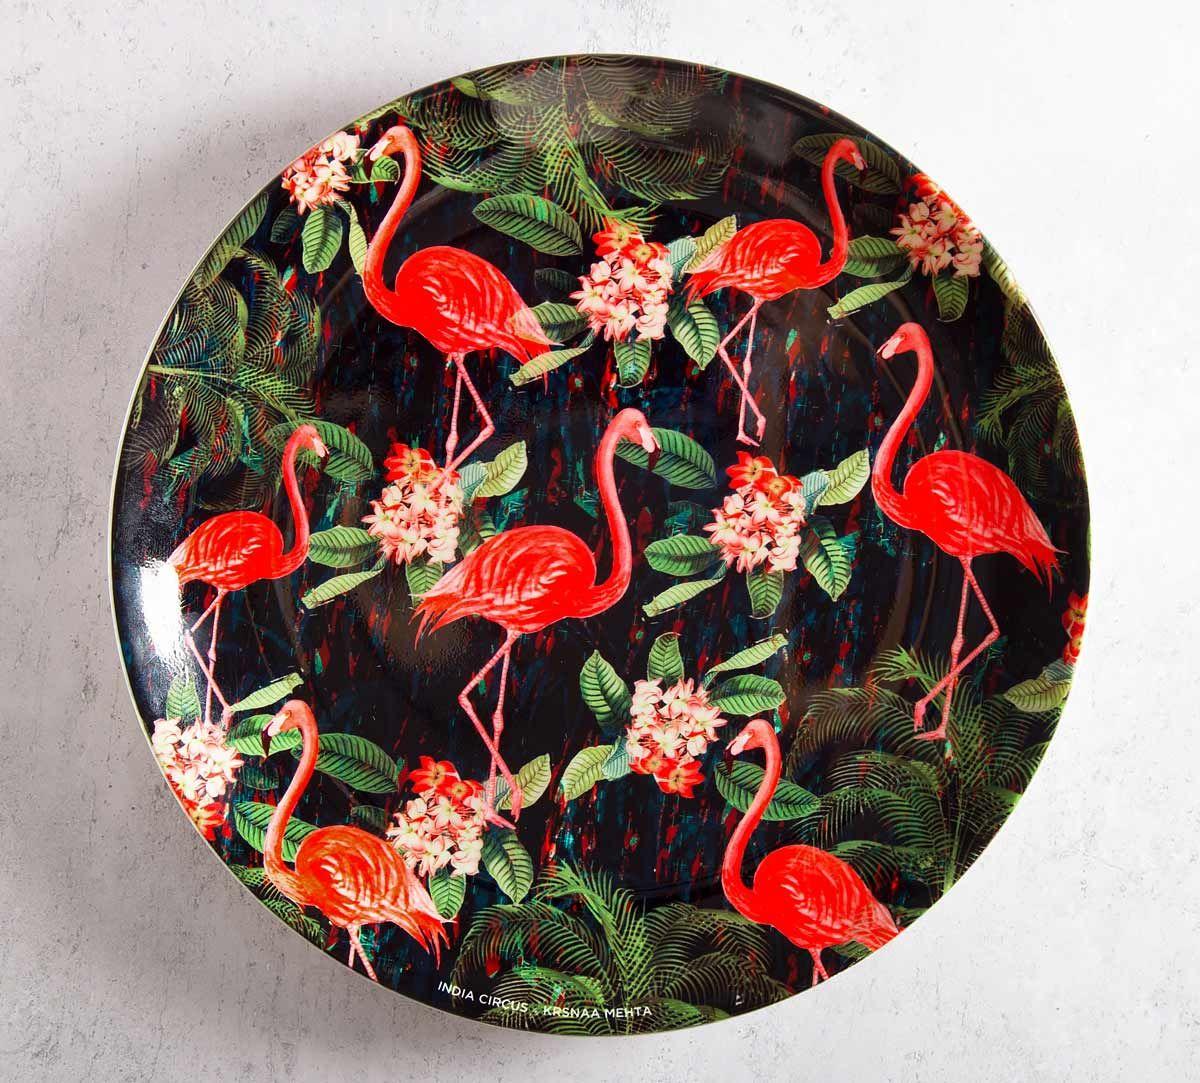 India Circus Moksha Hansa 10 inch Decorative and Snacks Platter